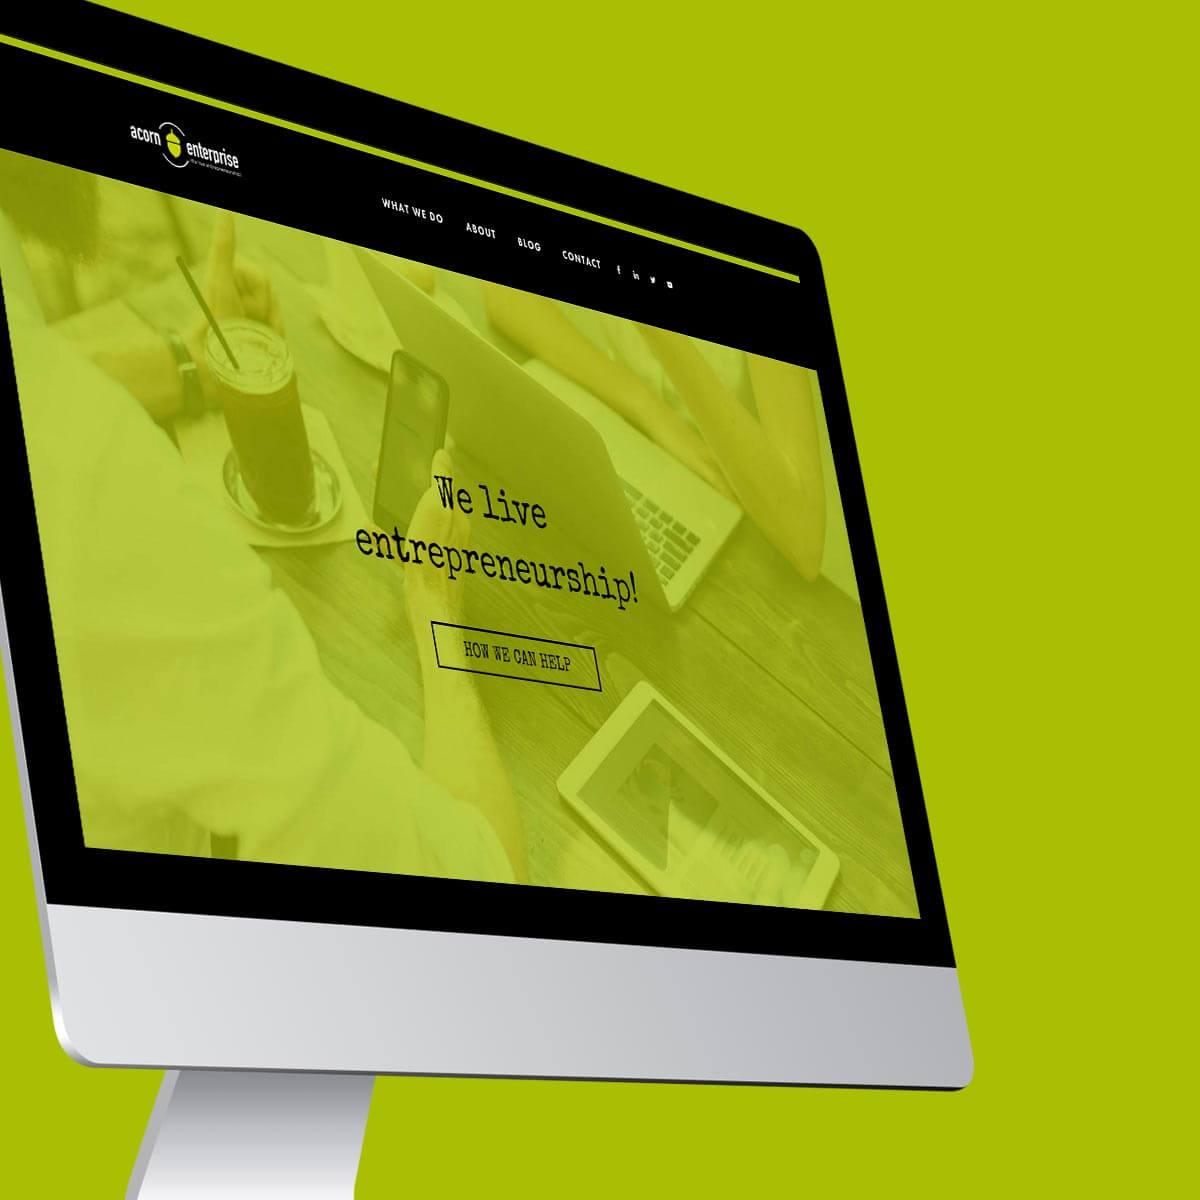 Acorn-Enterprise-Small-Business-Websites-Fife